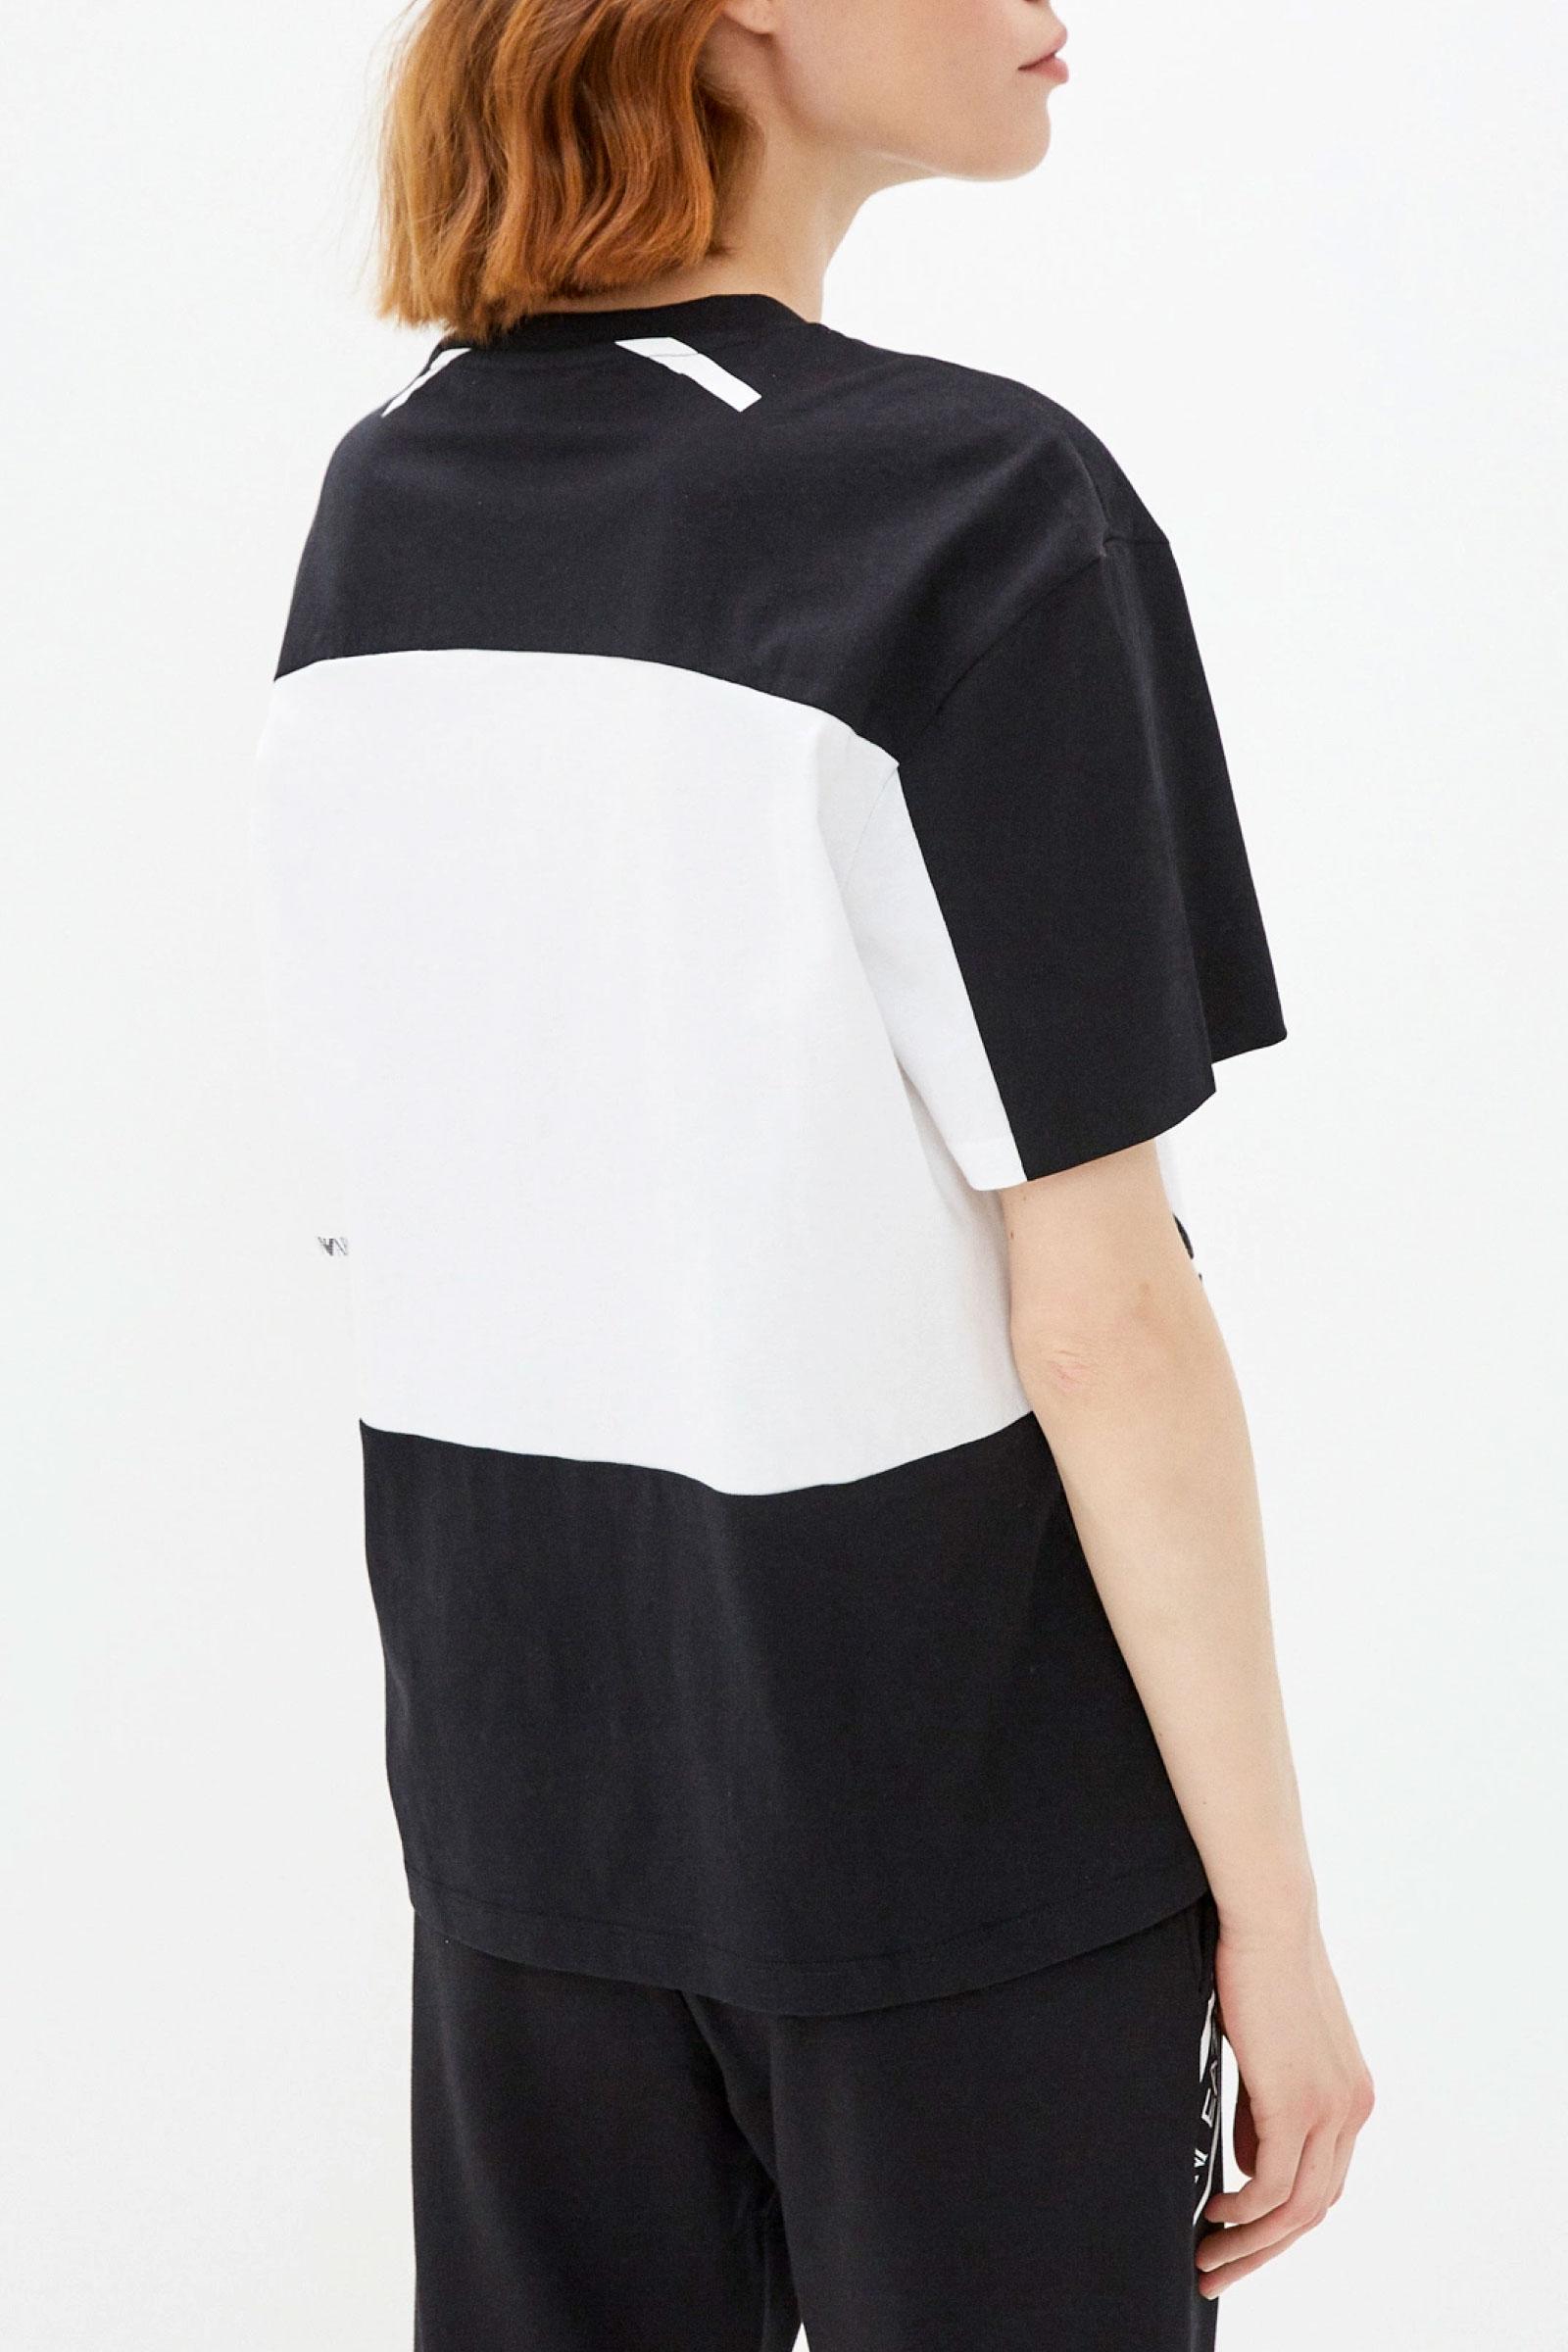 ARMANI EA7 Women's T-Shirt ARMANI EA7 | T-Shirt | 3KTT04 TJ9ZZ1200